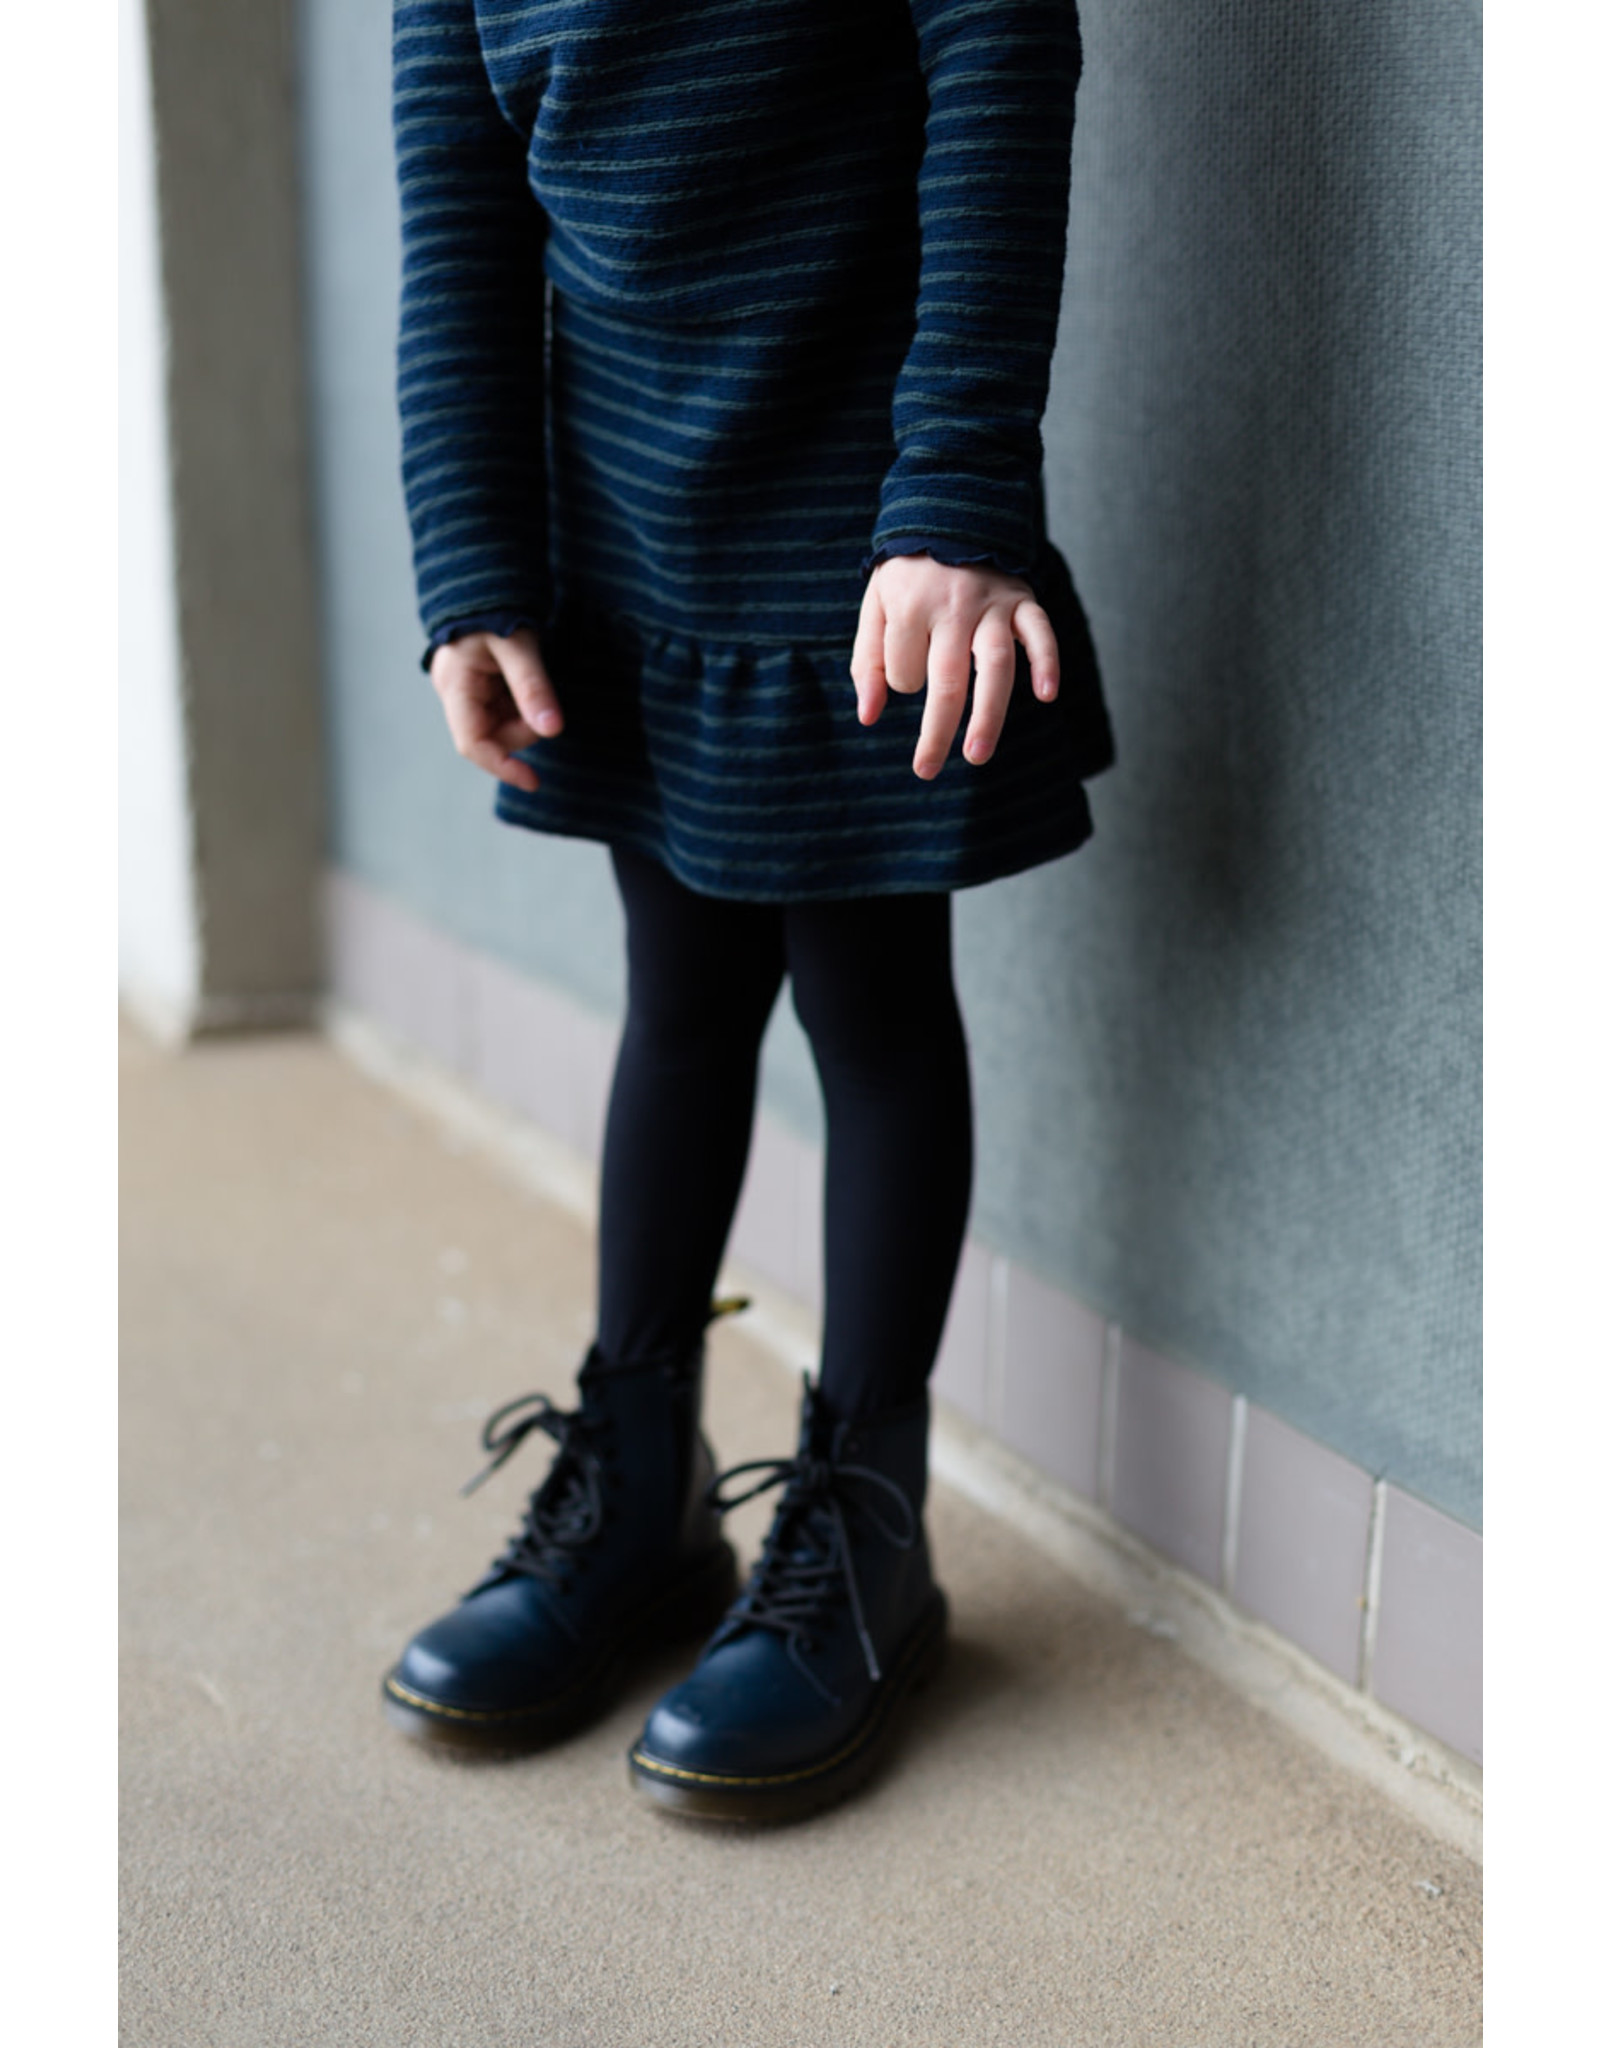 LEVV Levv meisjes jurk Lara Dark Blue Stripe